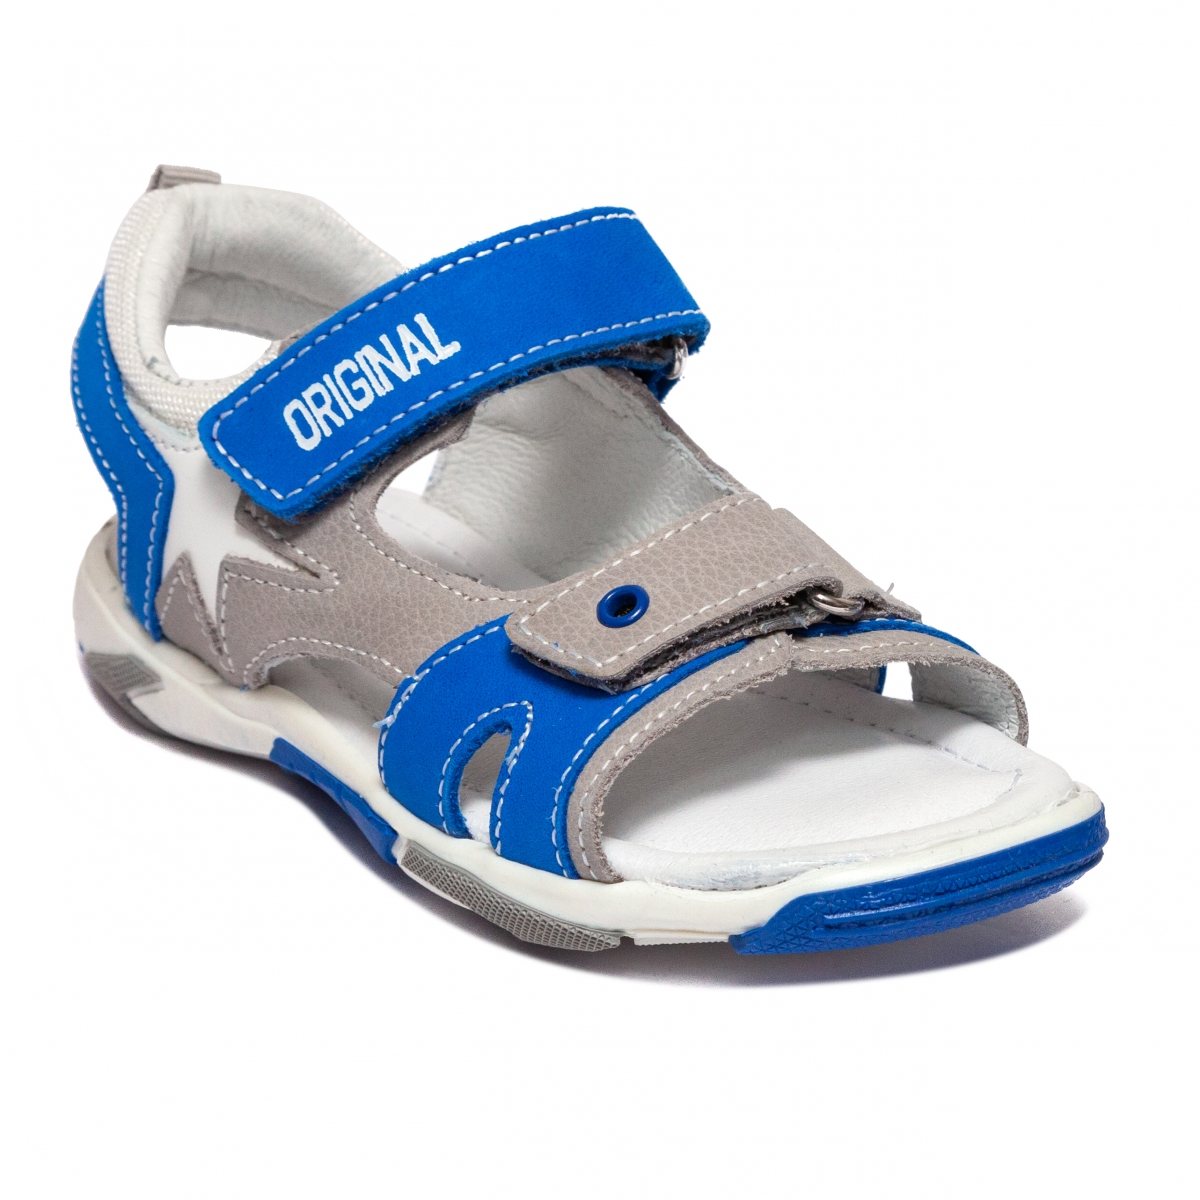 Sandale baieti Melania 6017 albastru gri 25-38